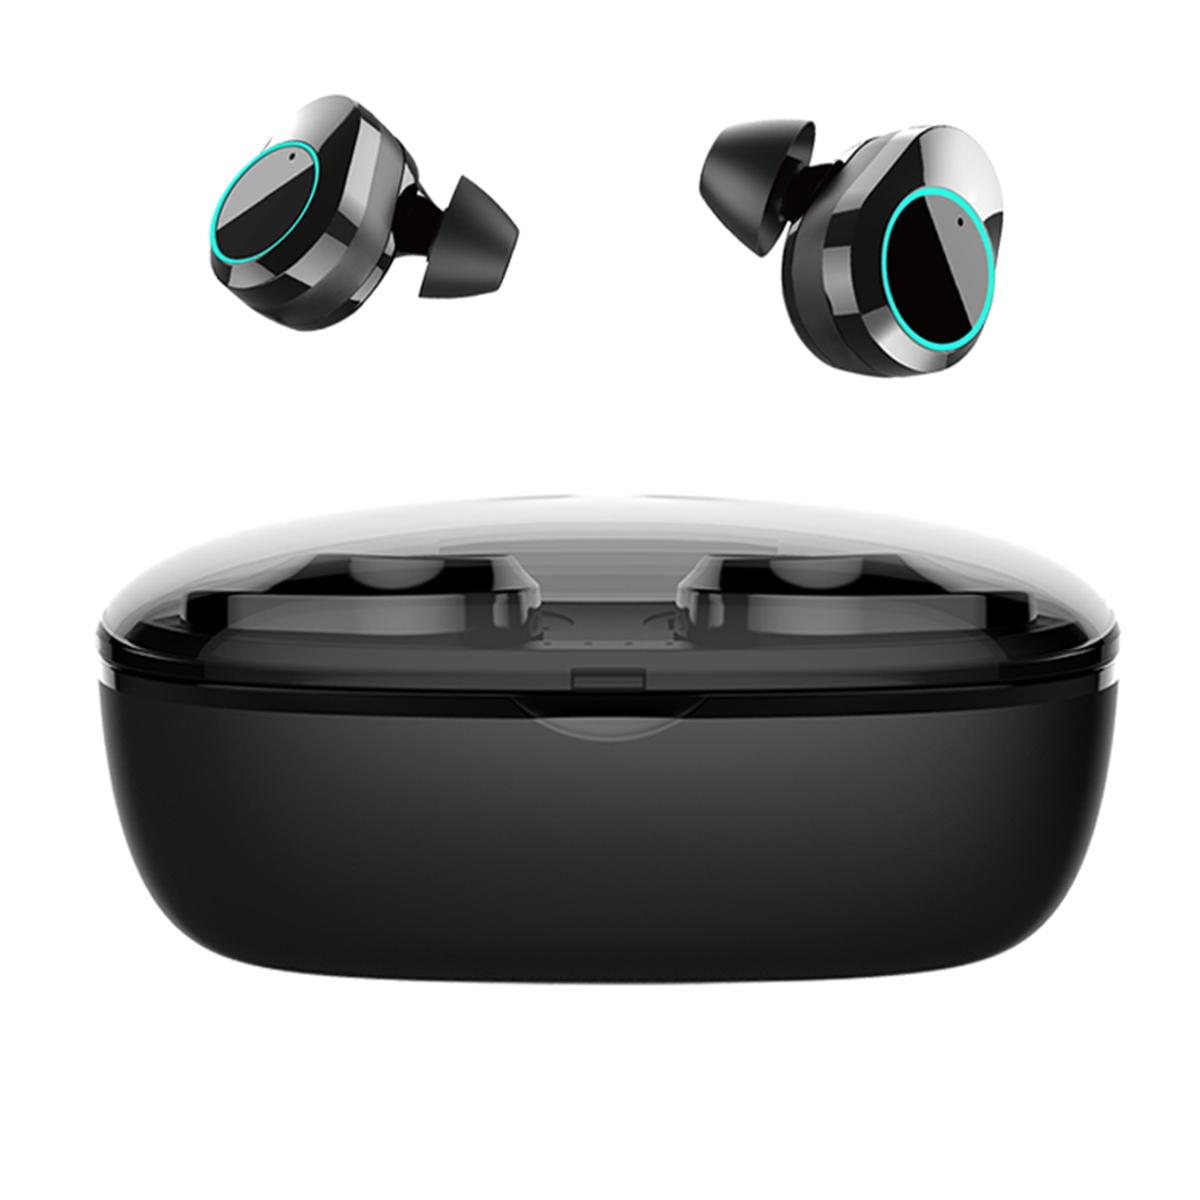 T2C TWS Bluetooth 5.0 earphone hifi stereo type-c charging case wholesale china 1 (12)